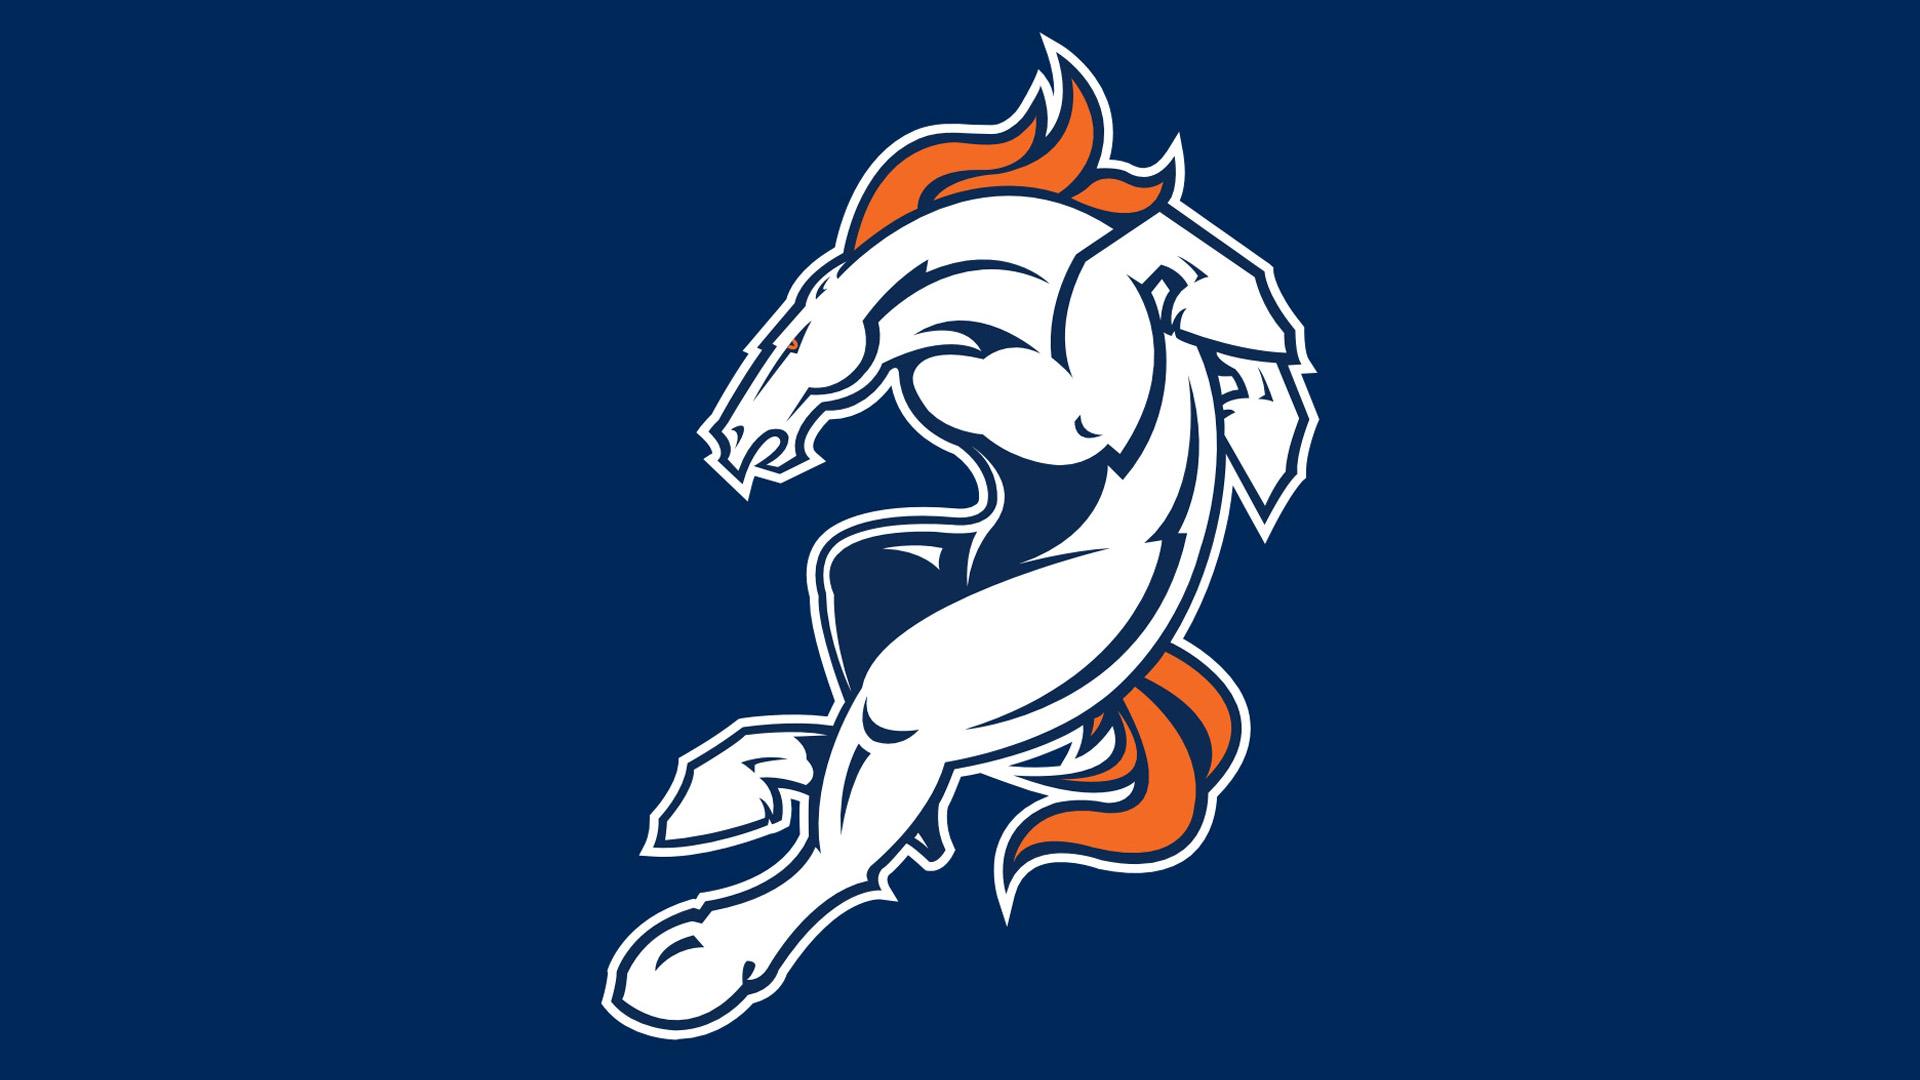 Broncos Horse